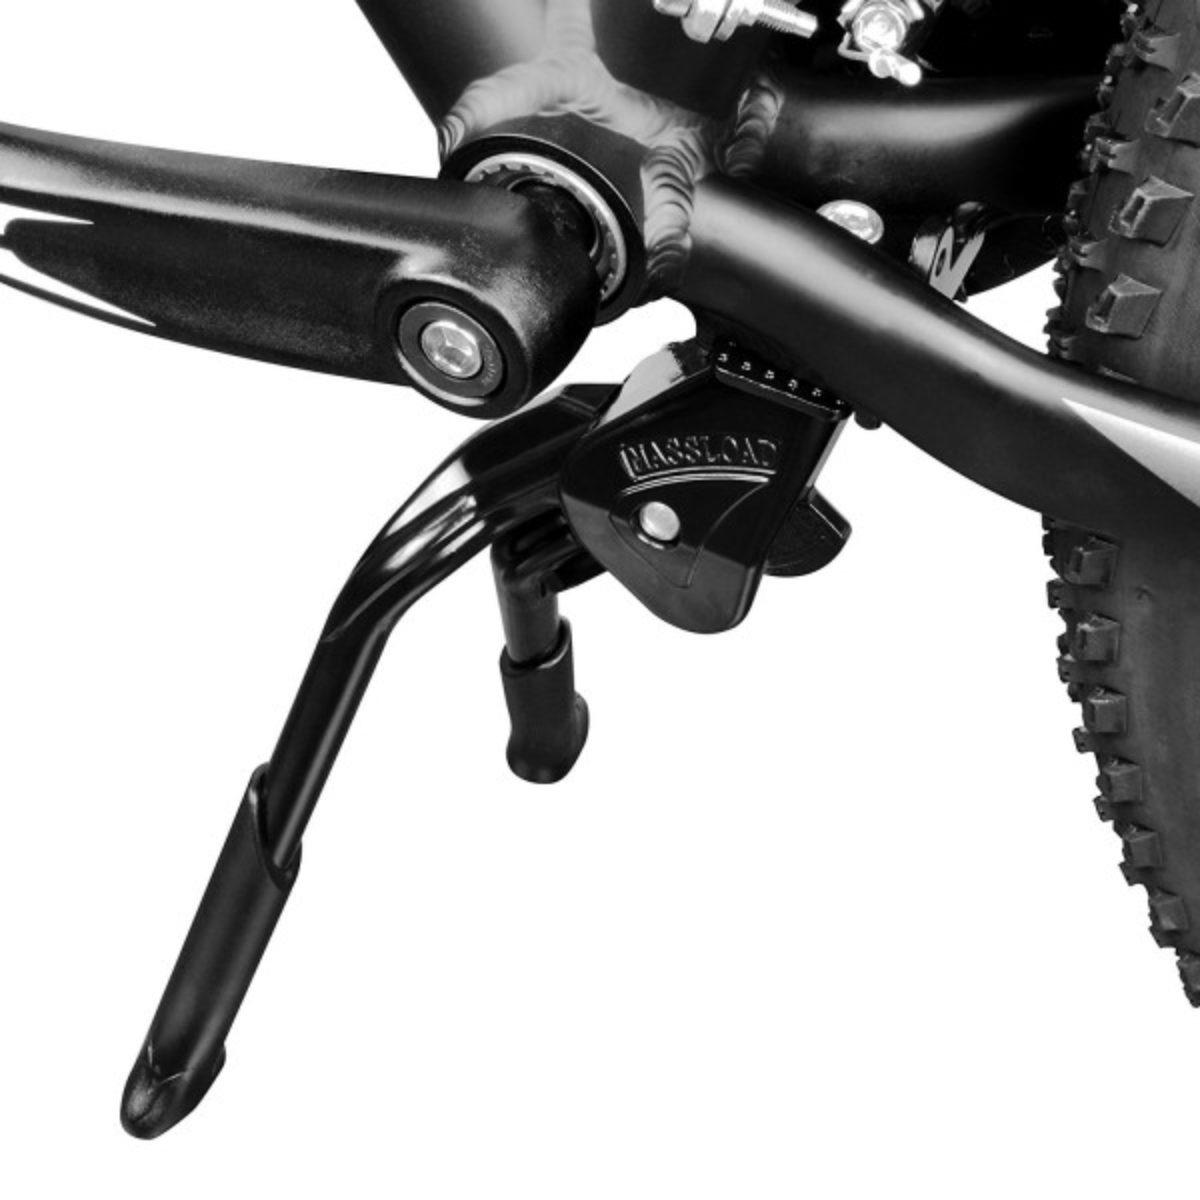 "LEICHTEN Adjustable Bicycle Kickstand Aluminum Alloy Bike Kick Stand for 24/""26 27.5 28 29 700c Mountain Bike//Road Bike//BMX//Adults Bike//City Bike Storage"